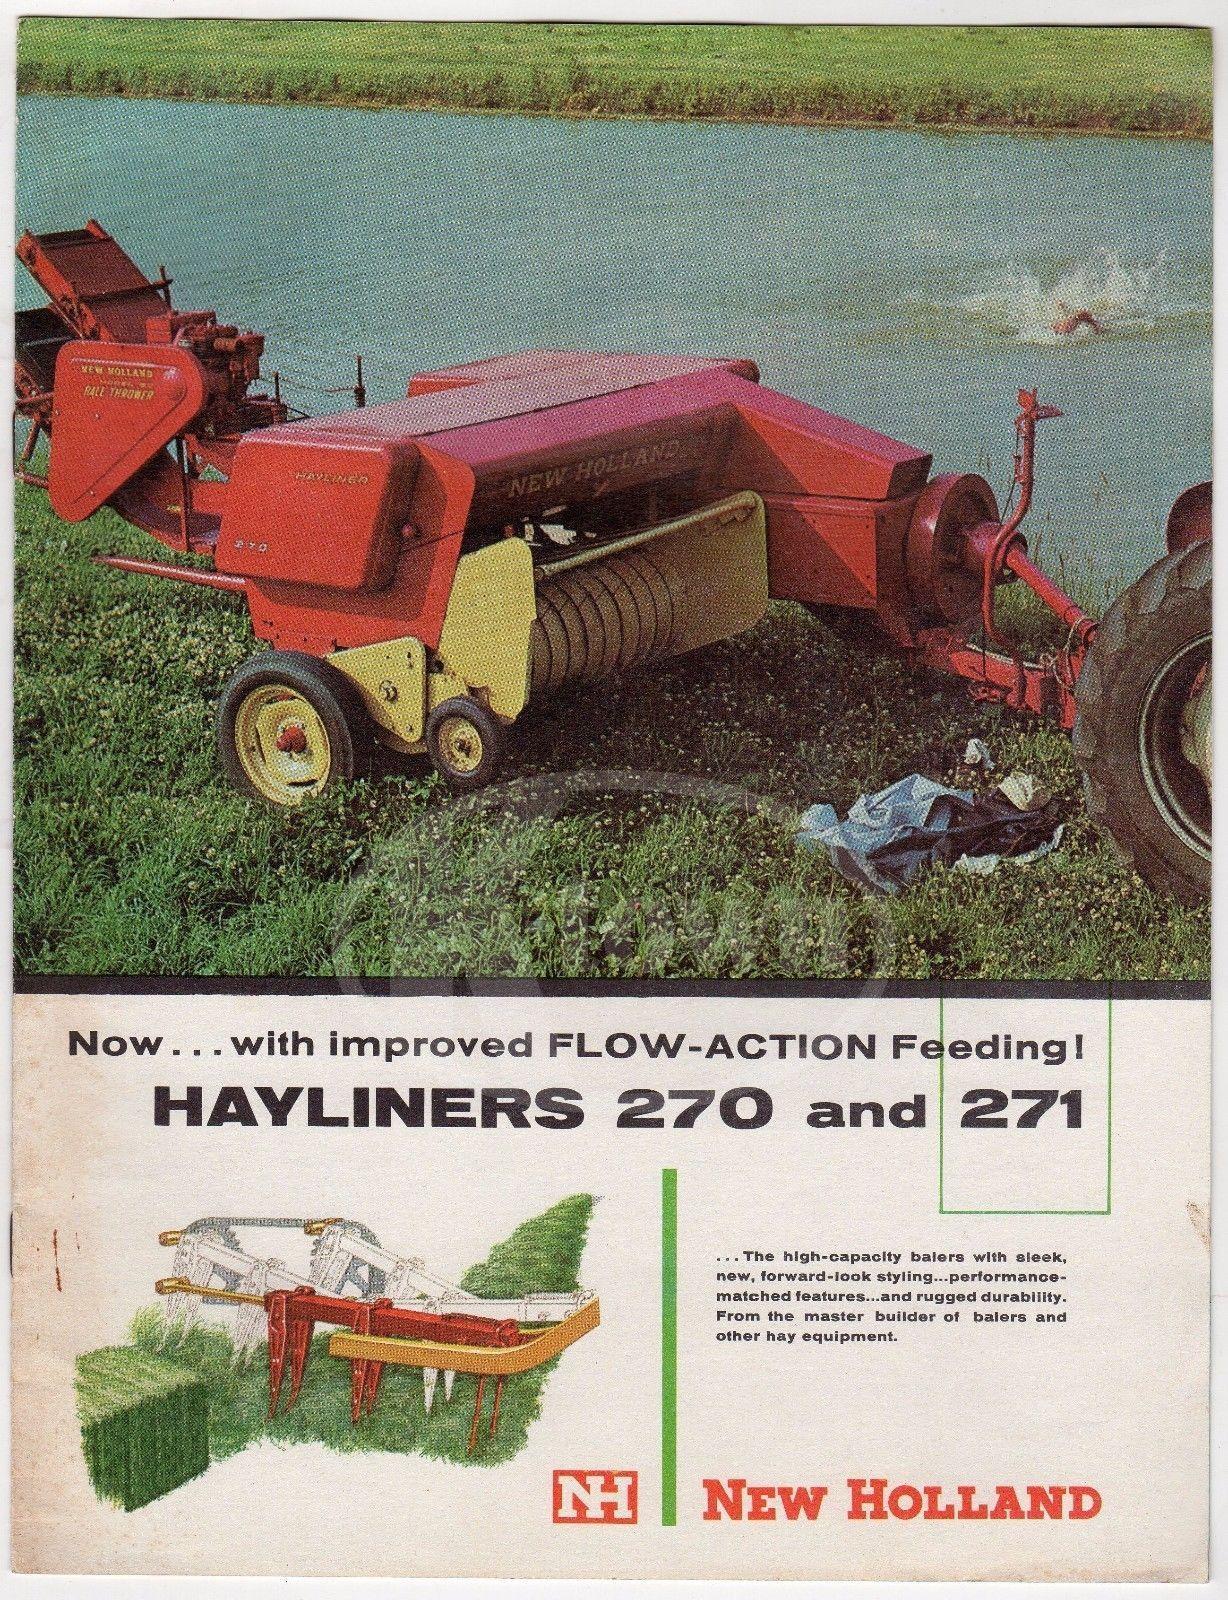 New holland farm machinery hayliner 270 271 vintage graphic